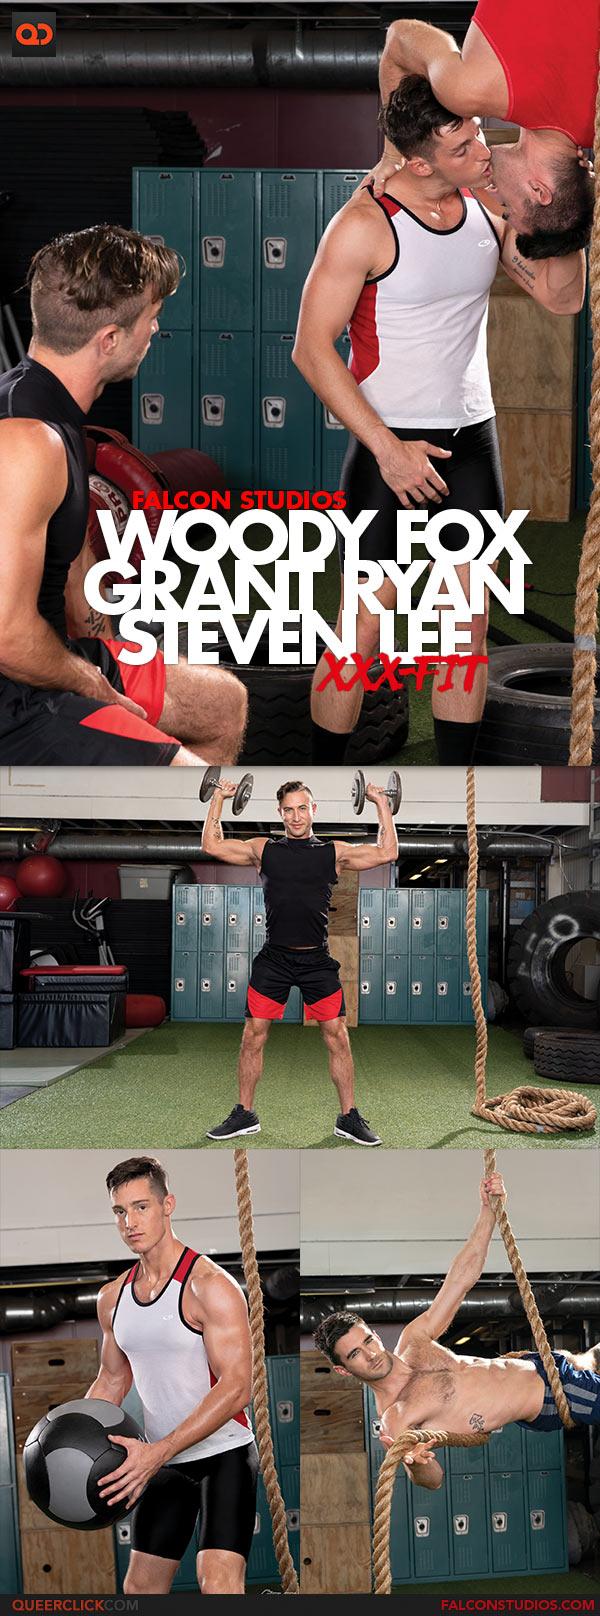 Falcon Studios: Woody Fox and Steven Lee Fuck Grant Ryan - XXX-Fit